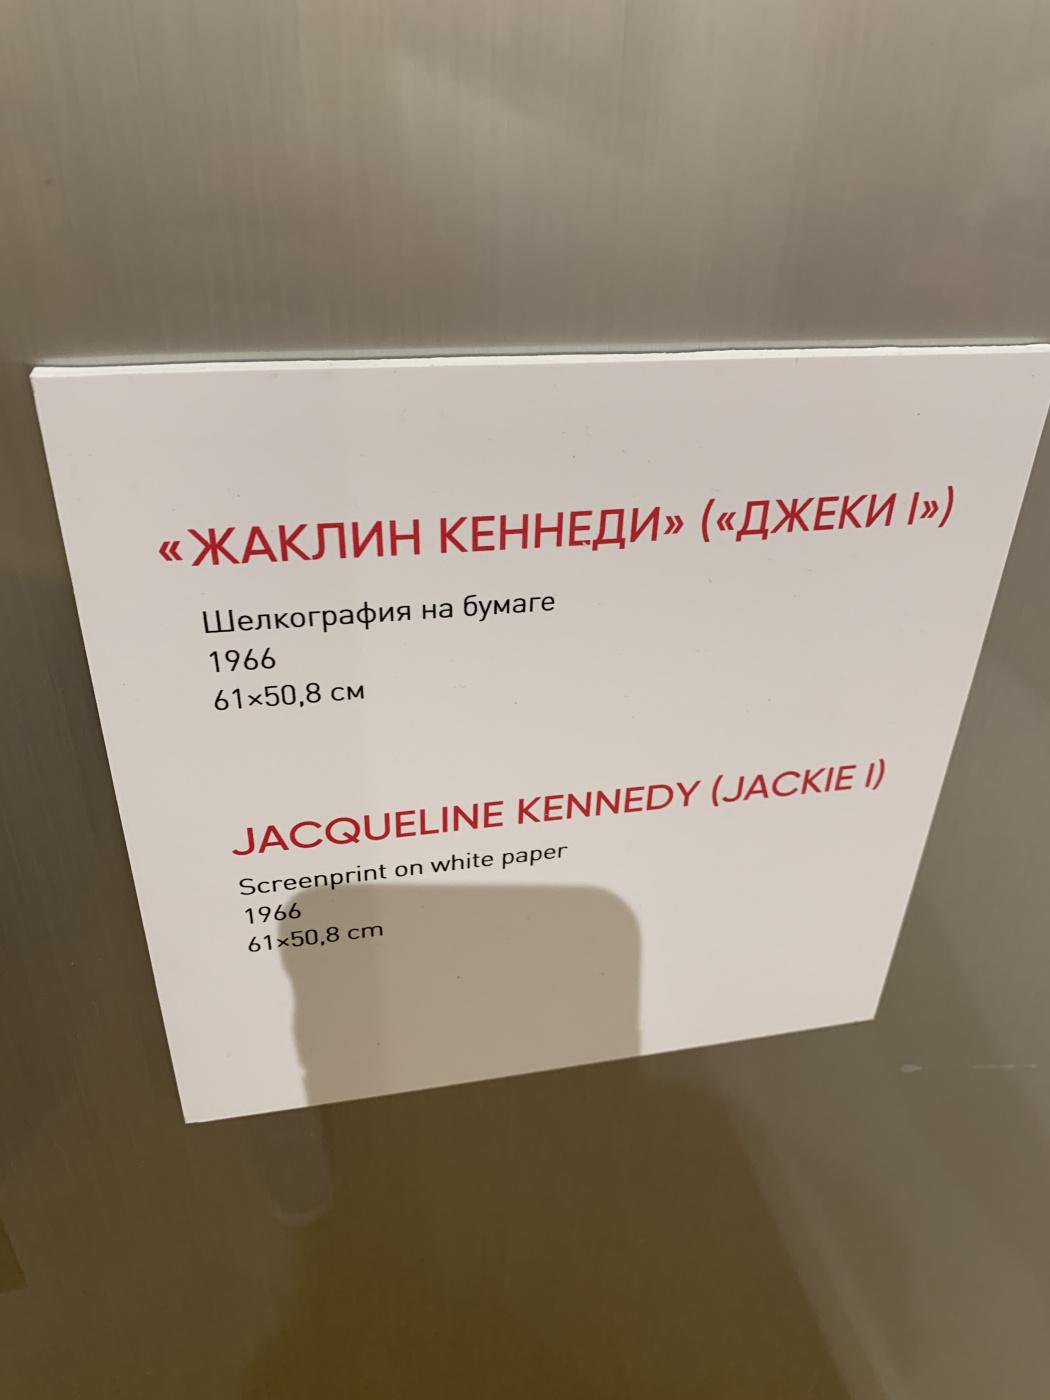 Jacqueline Kennedy (Jackie 1)